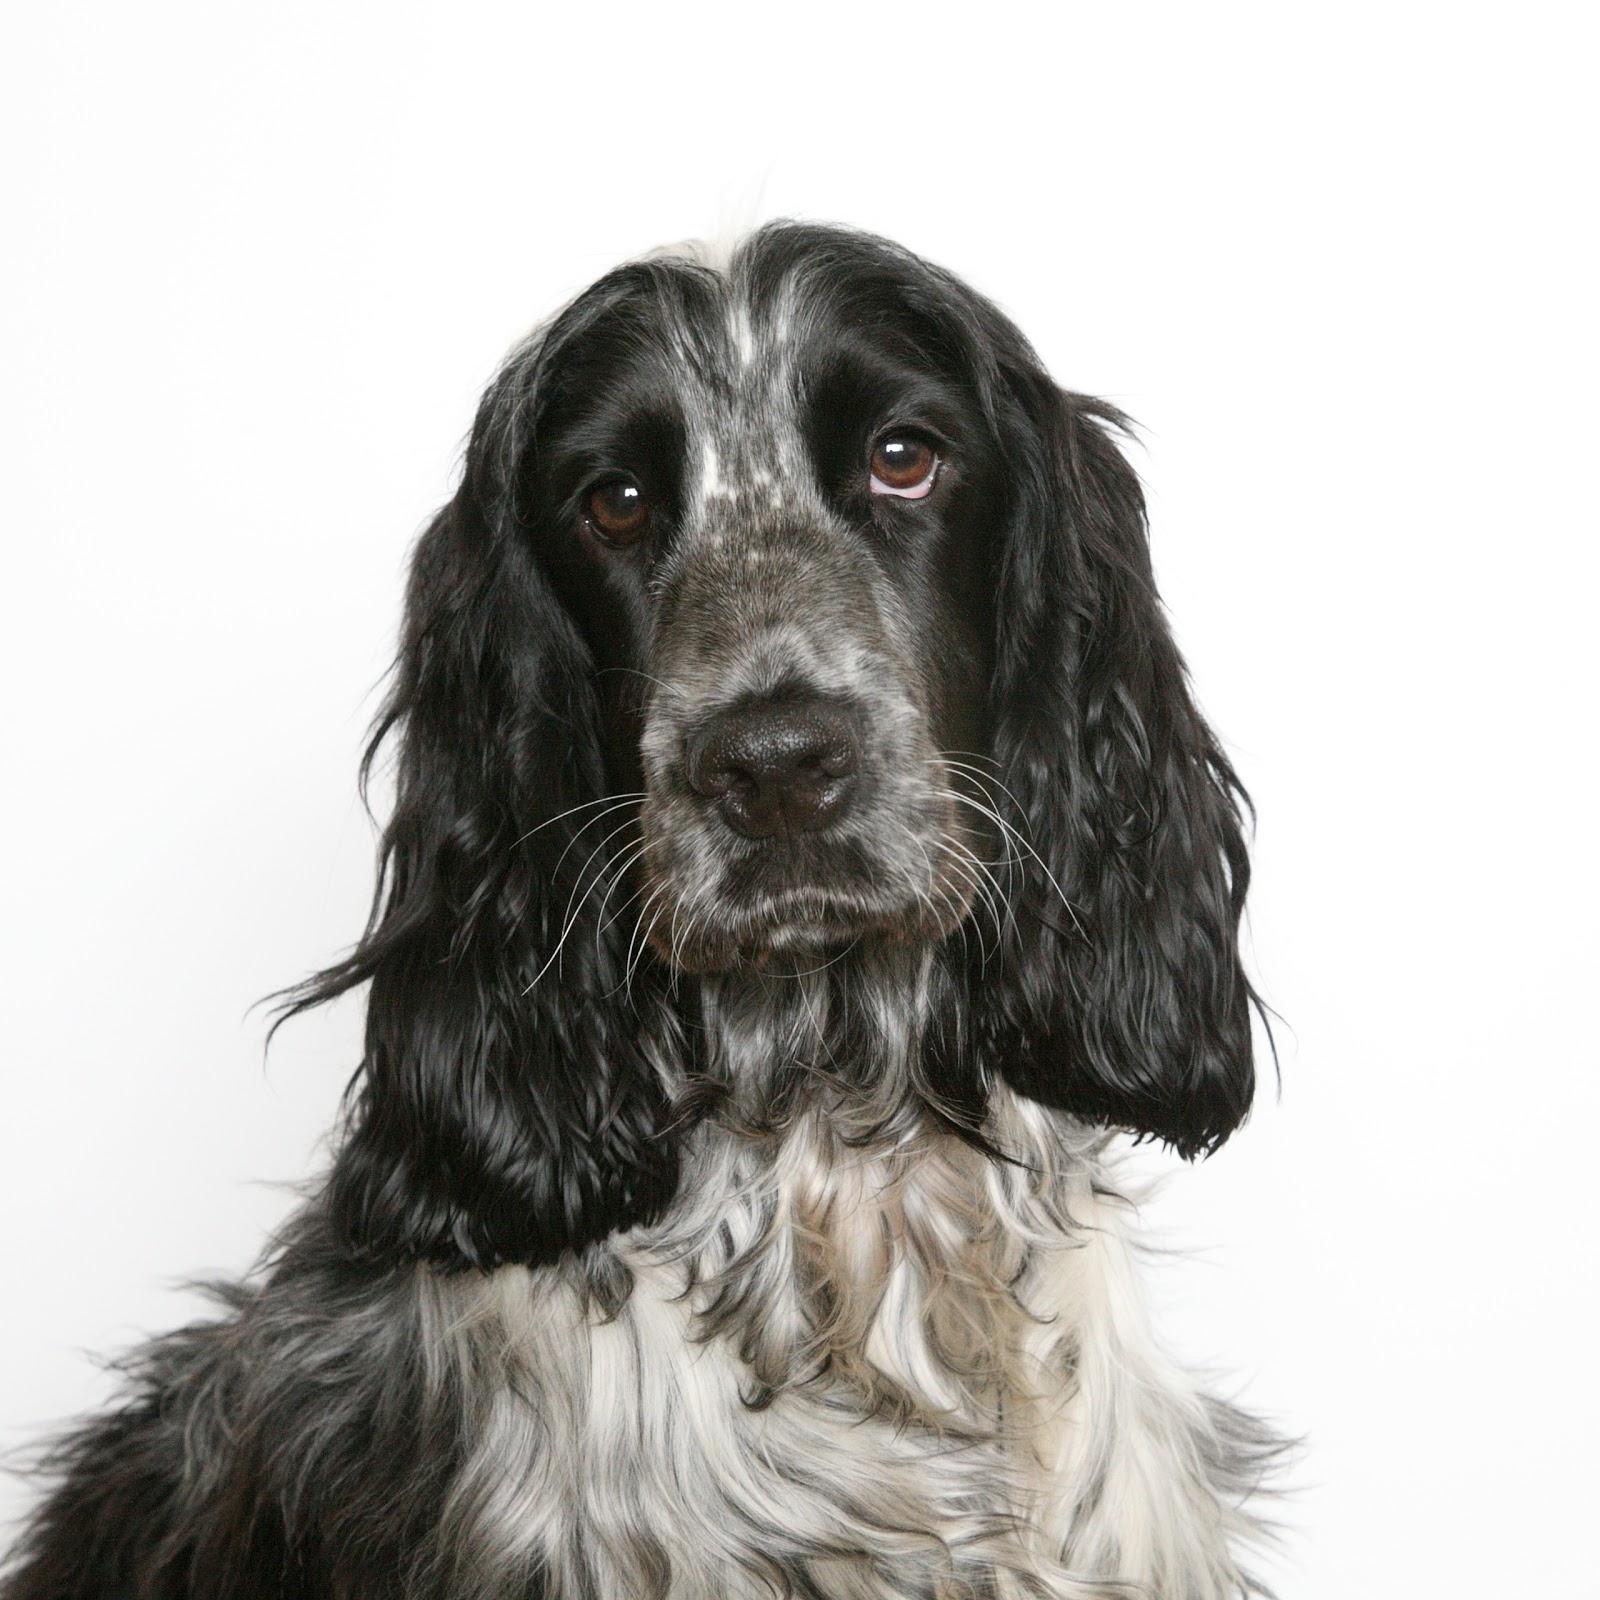 Dog Photo: Kind Of American Cocker Spaniel Dog